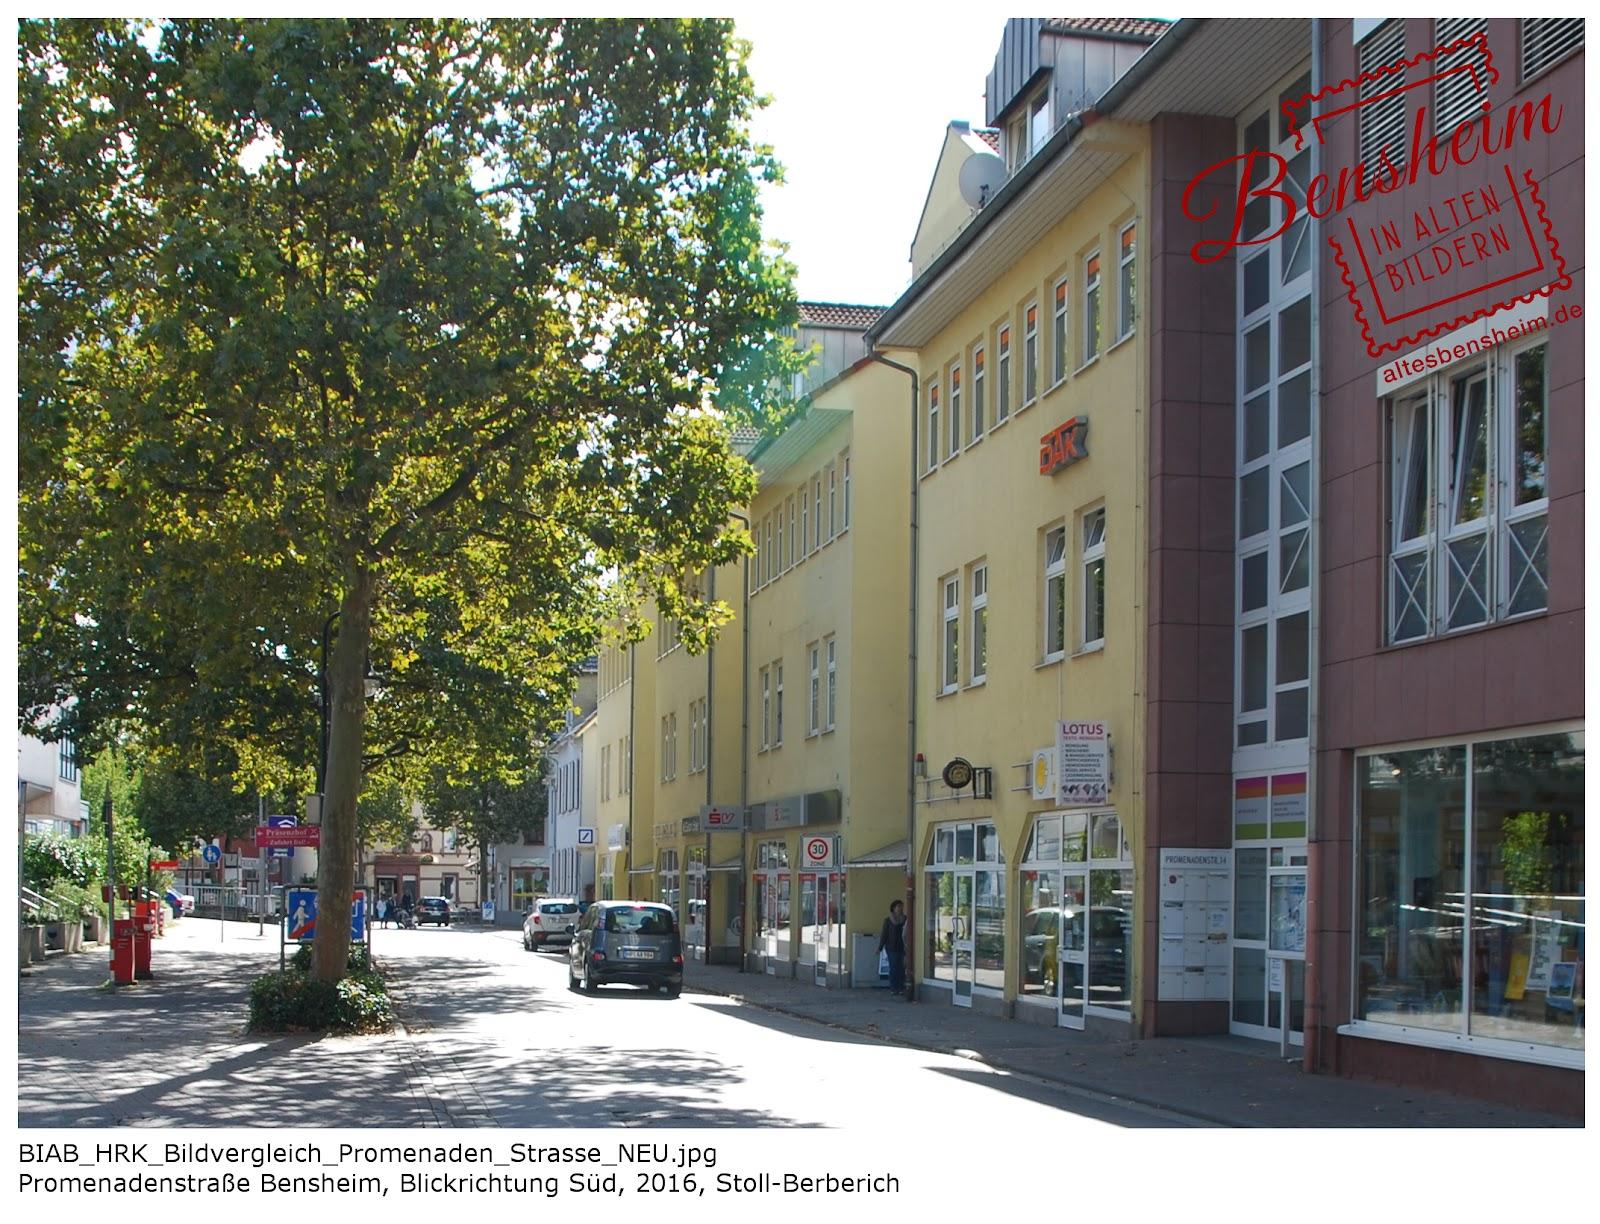 Promenadenstraße Bensheim, Stoll-Berberich 2016